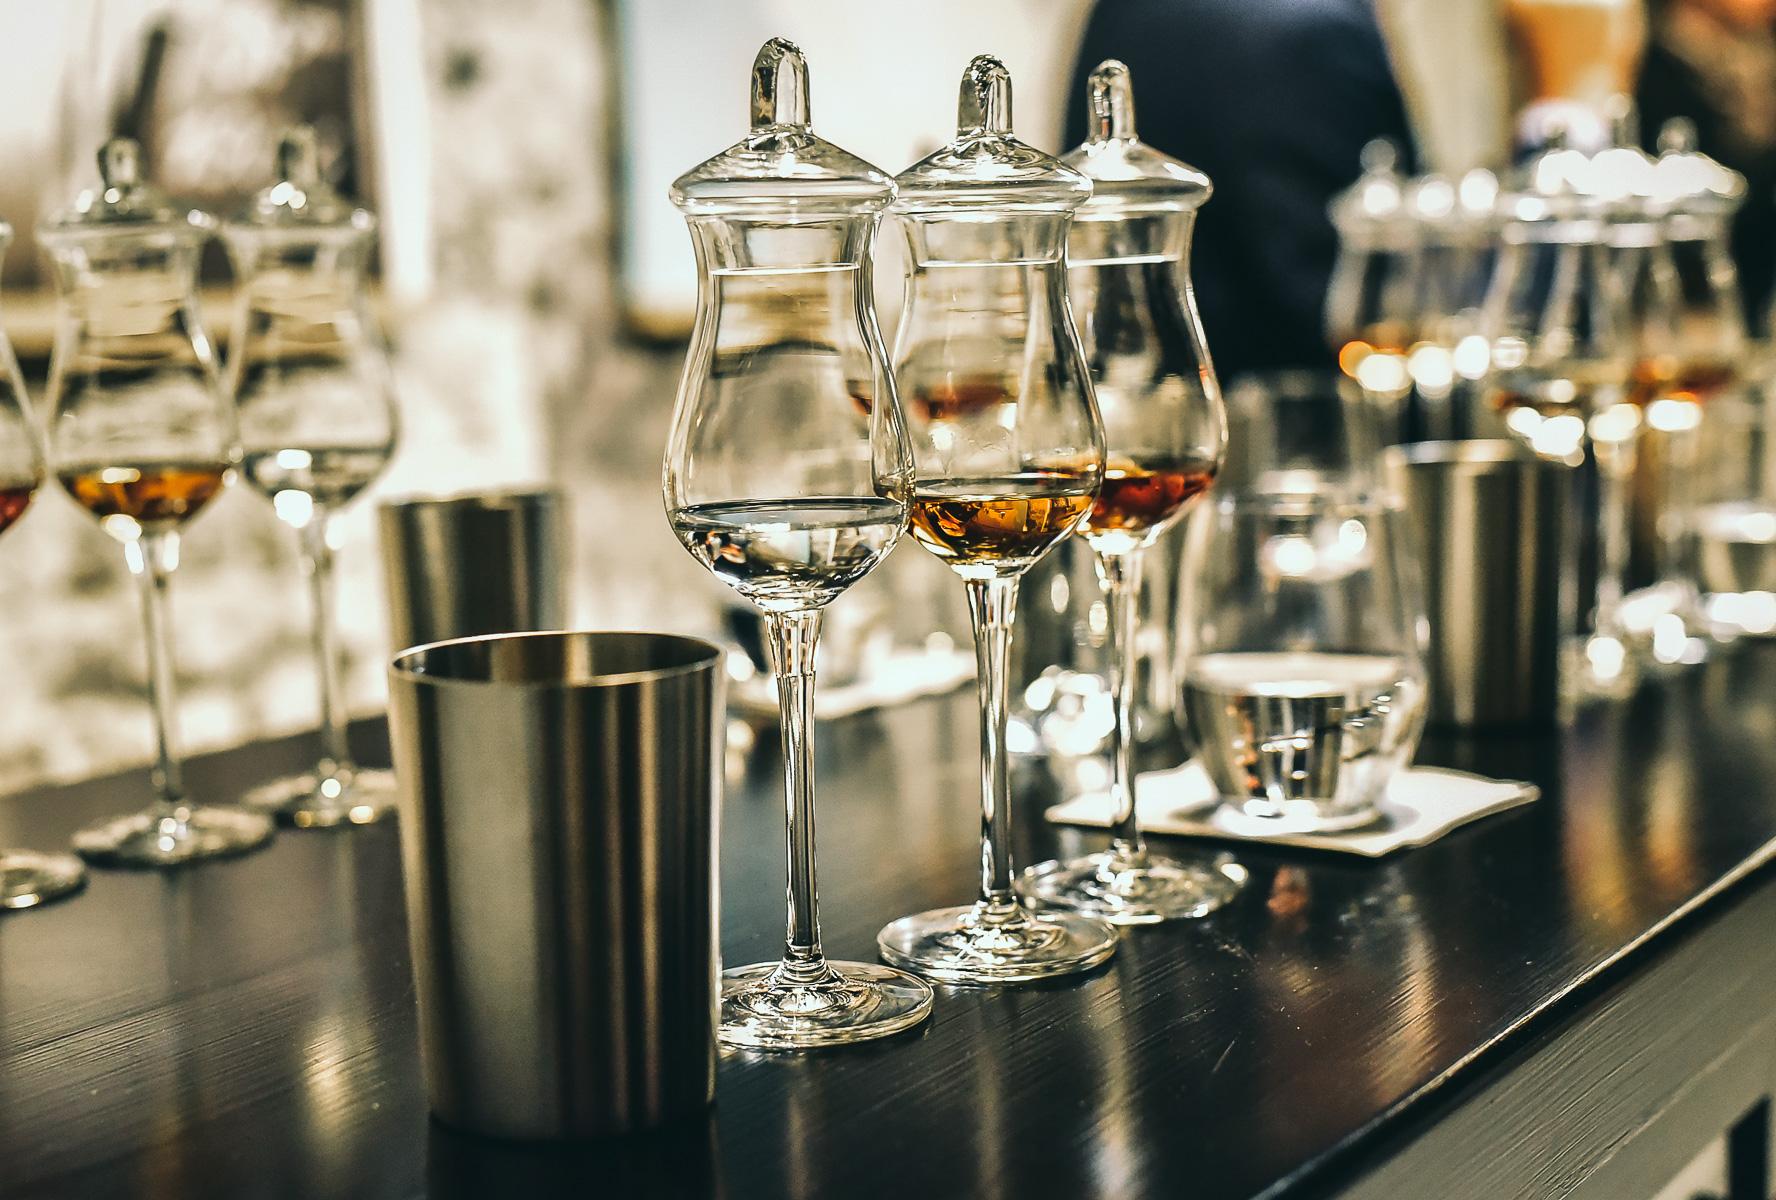 Tommeezjerry-Maennermodeblog-Maennermode-Fashionblog-Styleblog-Berlinblog--Lifestyleblog-Grey-Goose-Le-Logis-Frankreich-Cognac-Le-Grand-Fizz-Vodka-1Tommeezjerry-Maennermodeblog-Maennermode-Fashionblog-Styleblog-Berlinblog--Lifestyleblog-Grey-Goose-Le-Logis-Frankreich-Cognac-Le-Grand-Fizz-Vodka